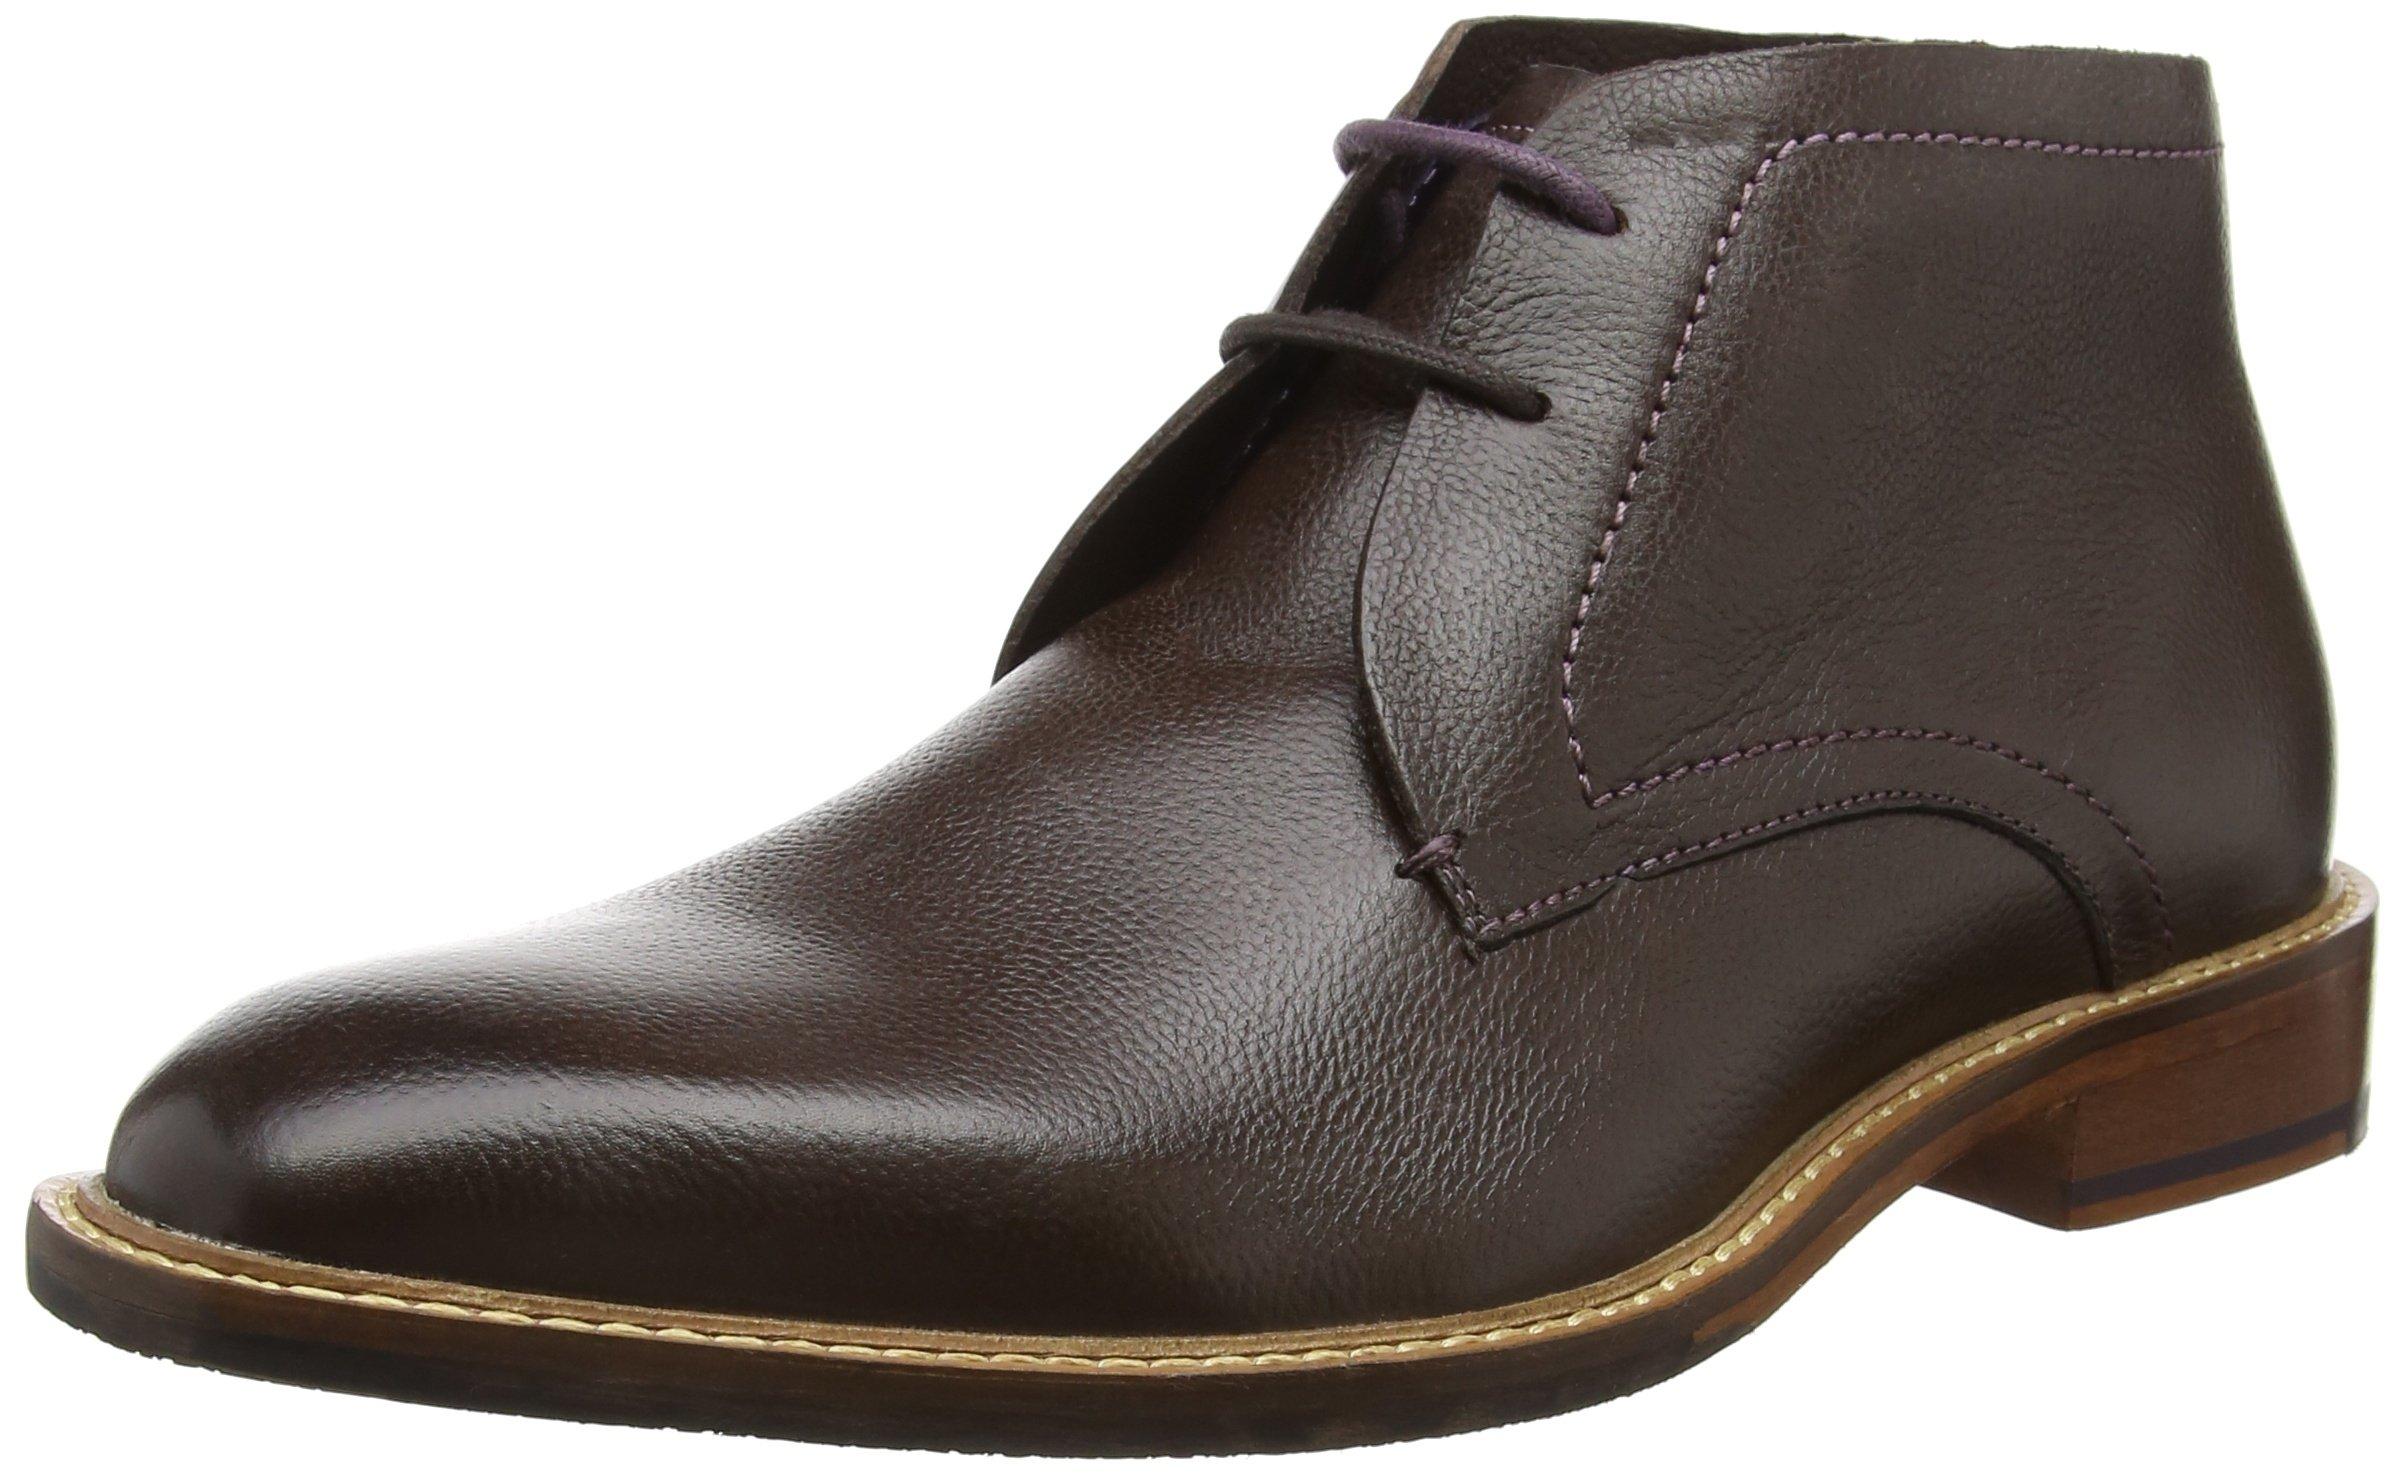 Ted Baker Torsdi 4 Men's Chukka Boots